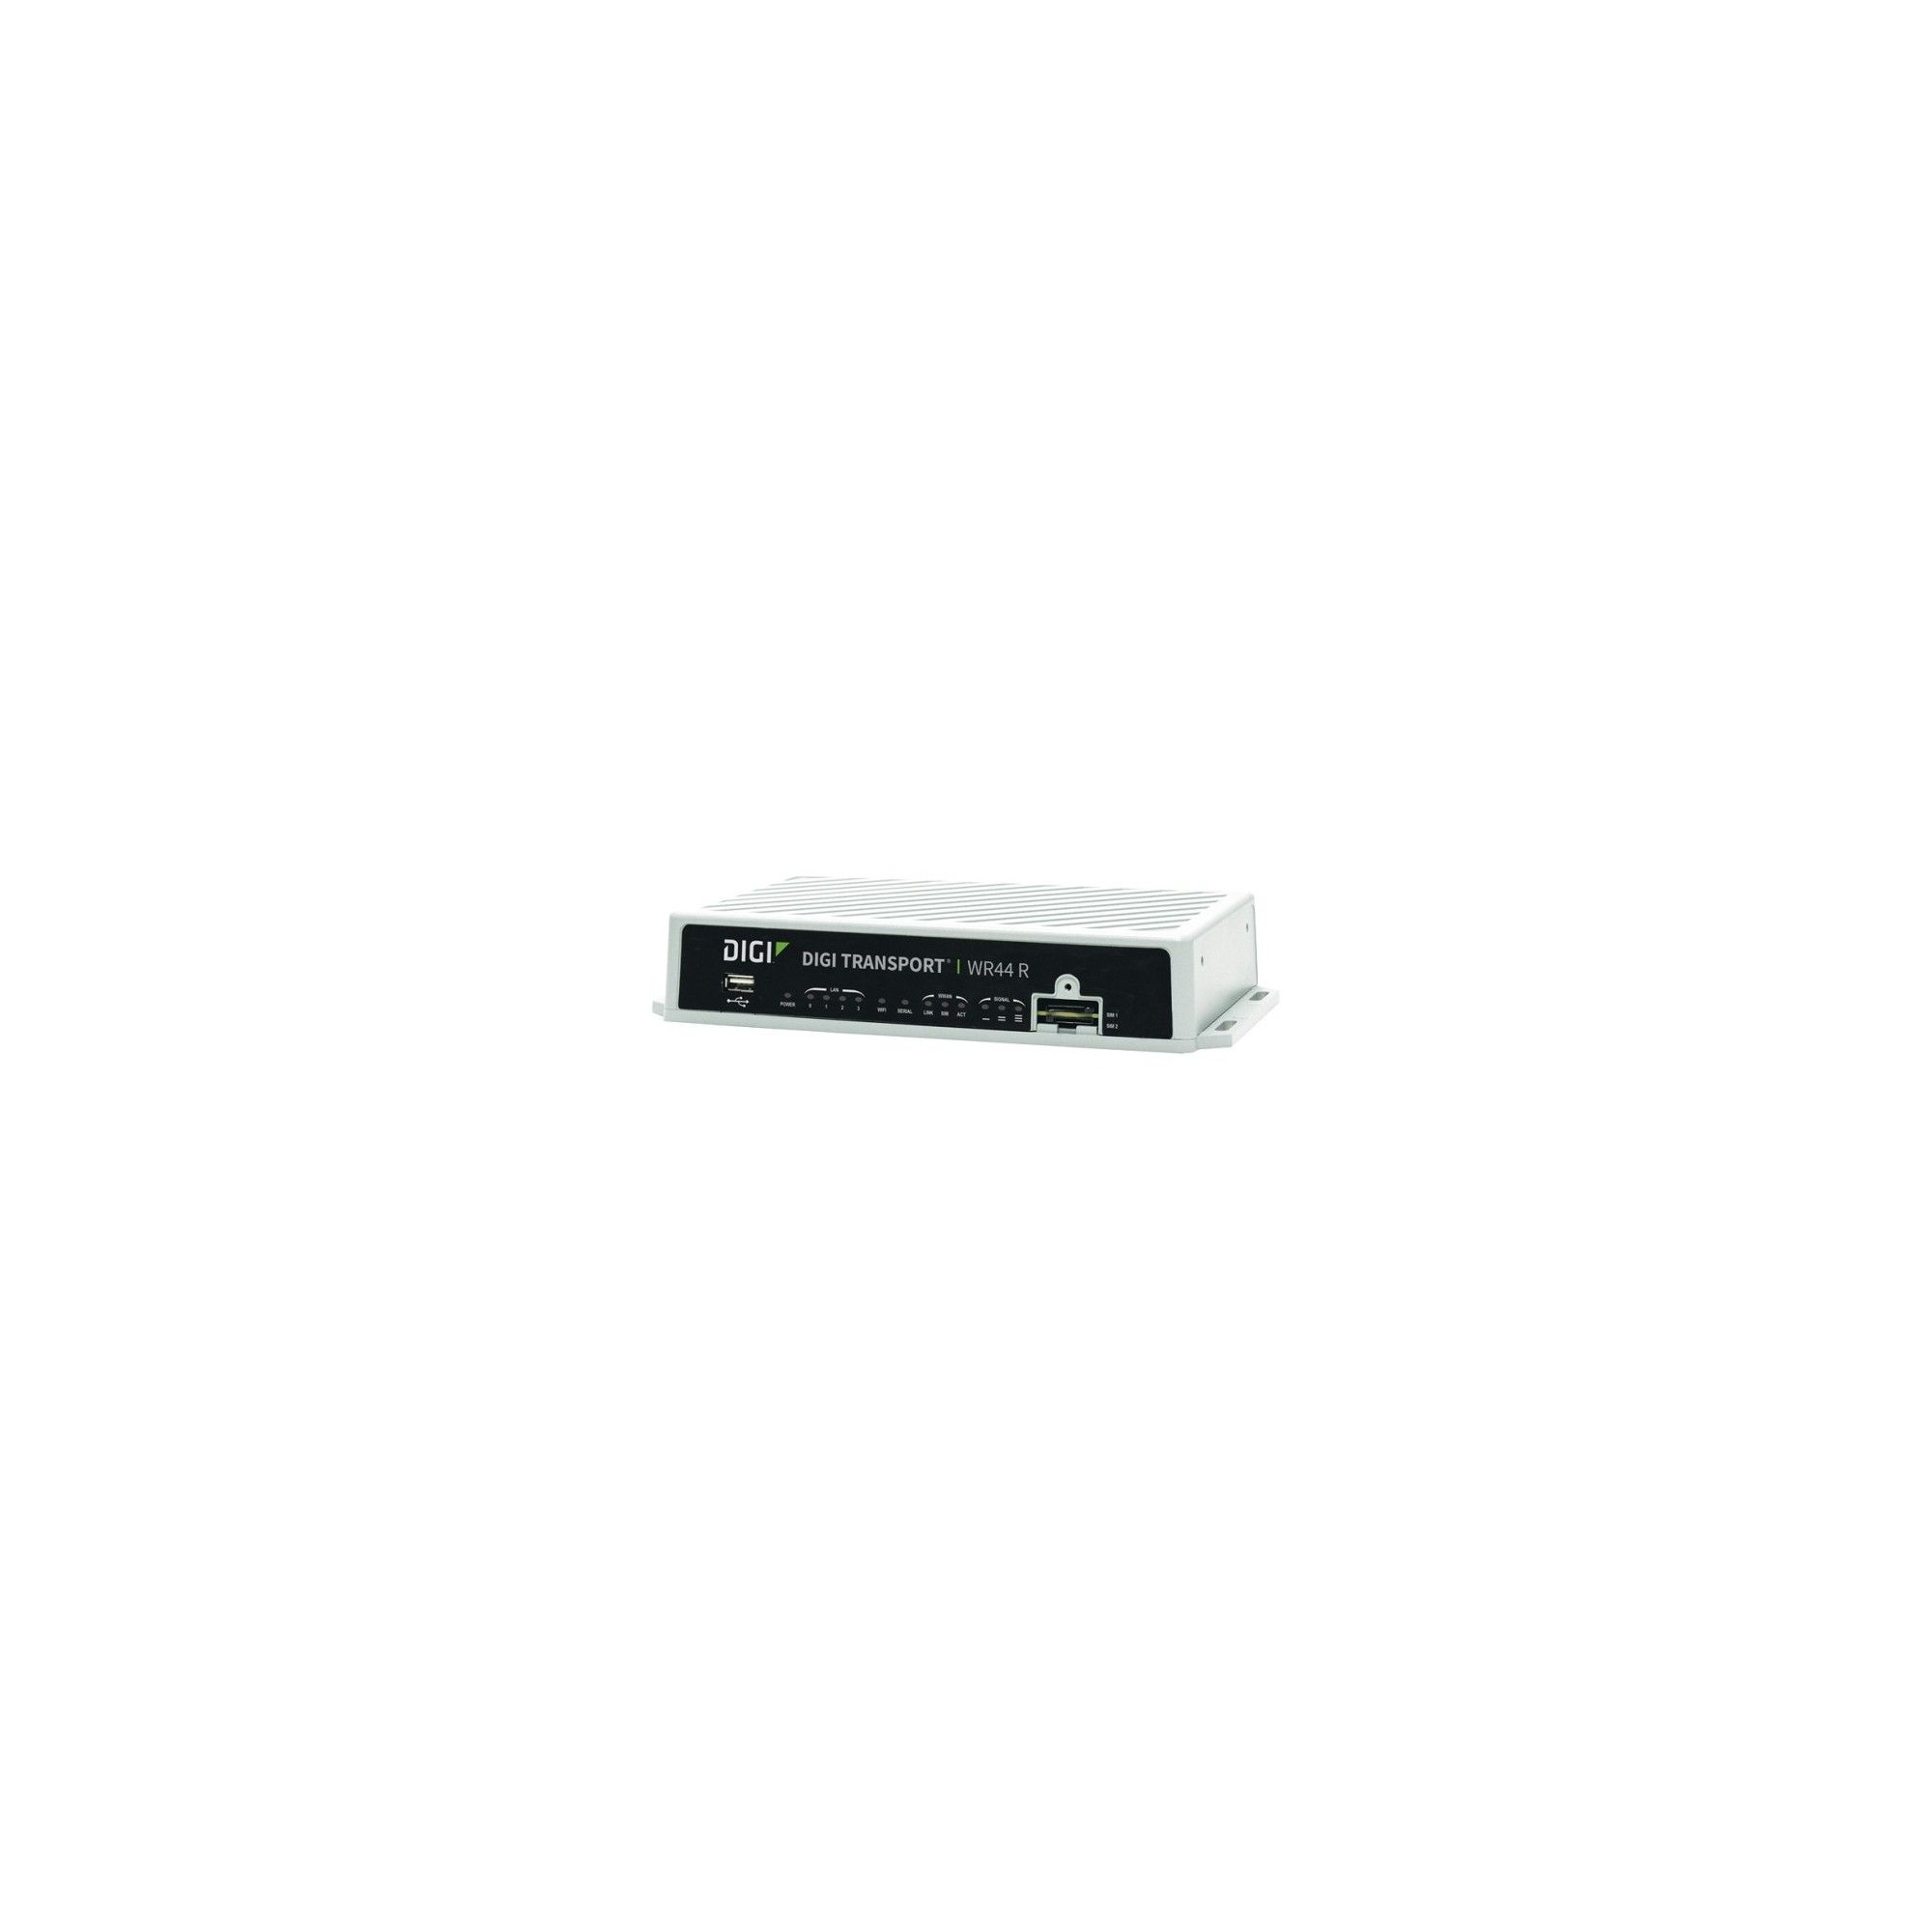 Digi TransPort WR44 R Ieee 802 11n Cellular Modem/Wireless Router